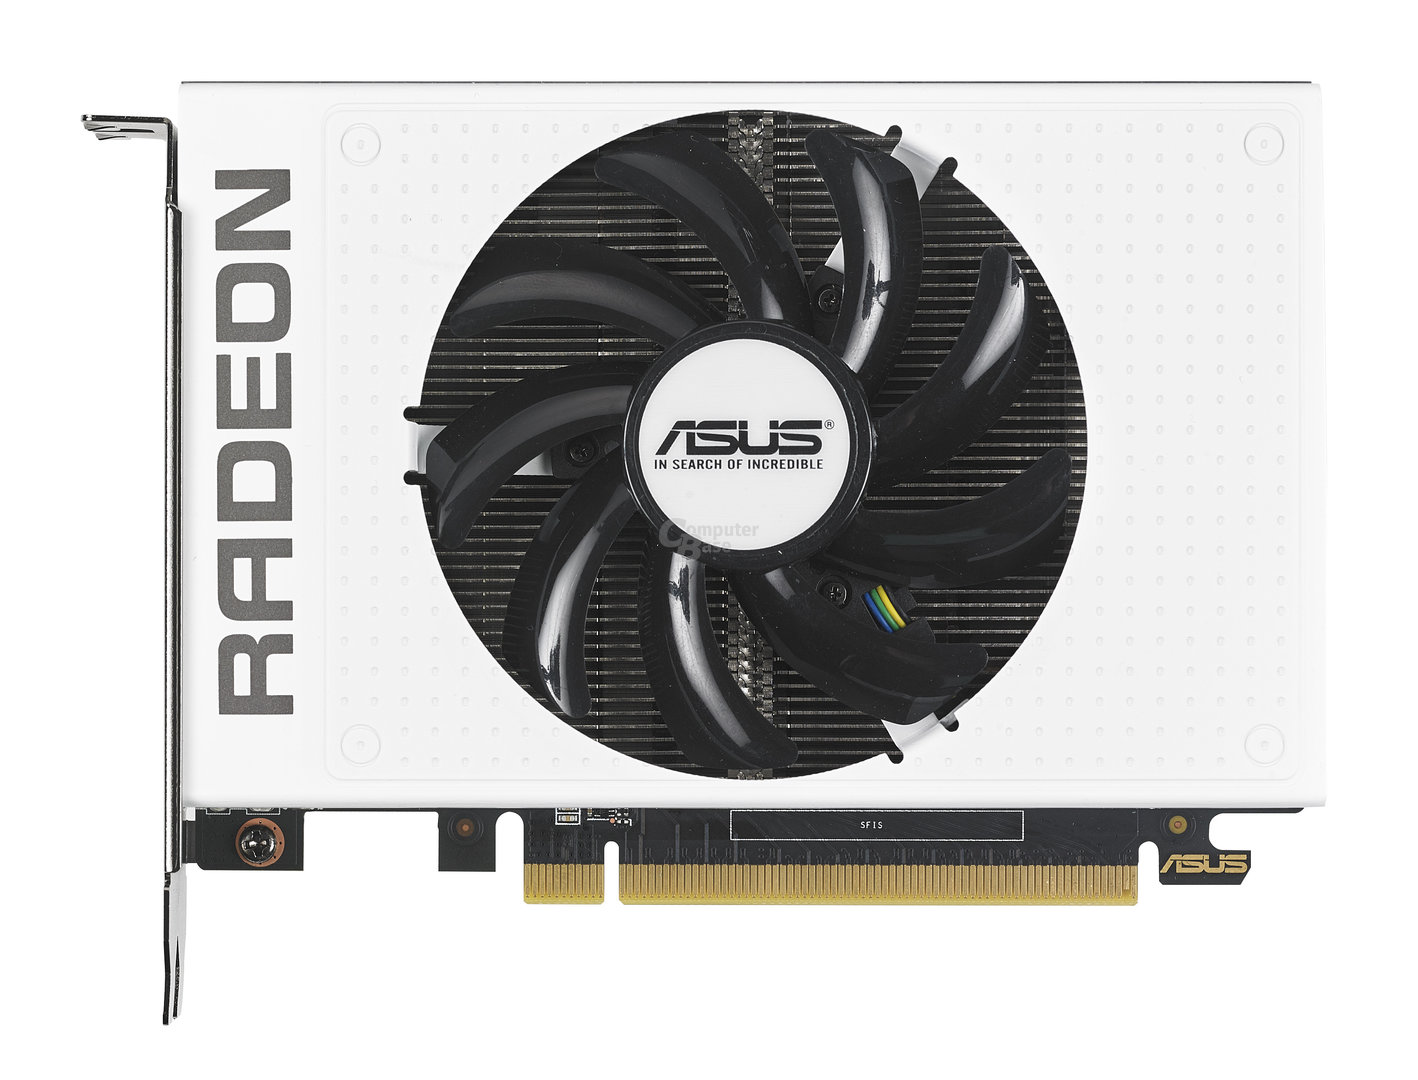 Asus Radeon R9 Nano White